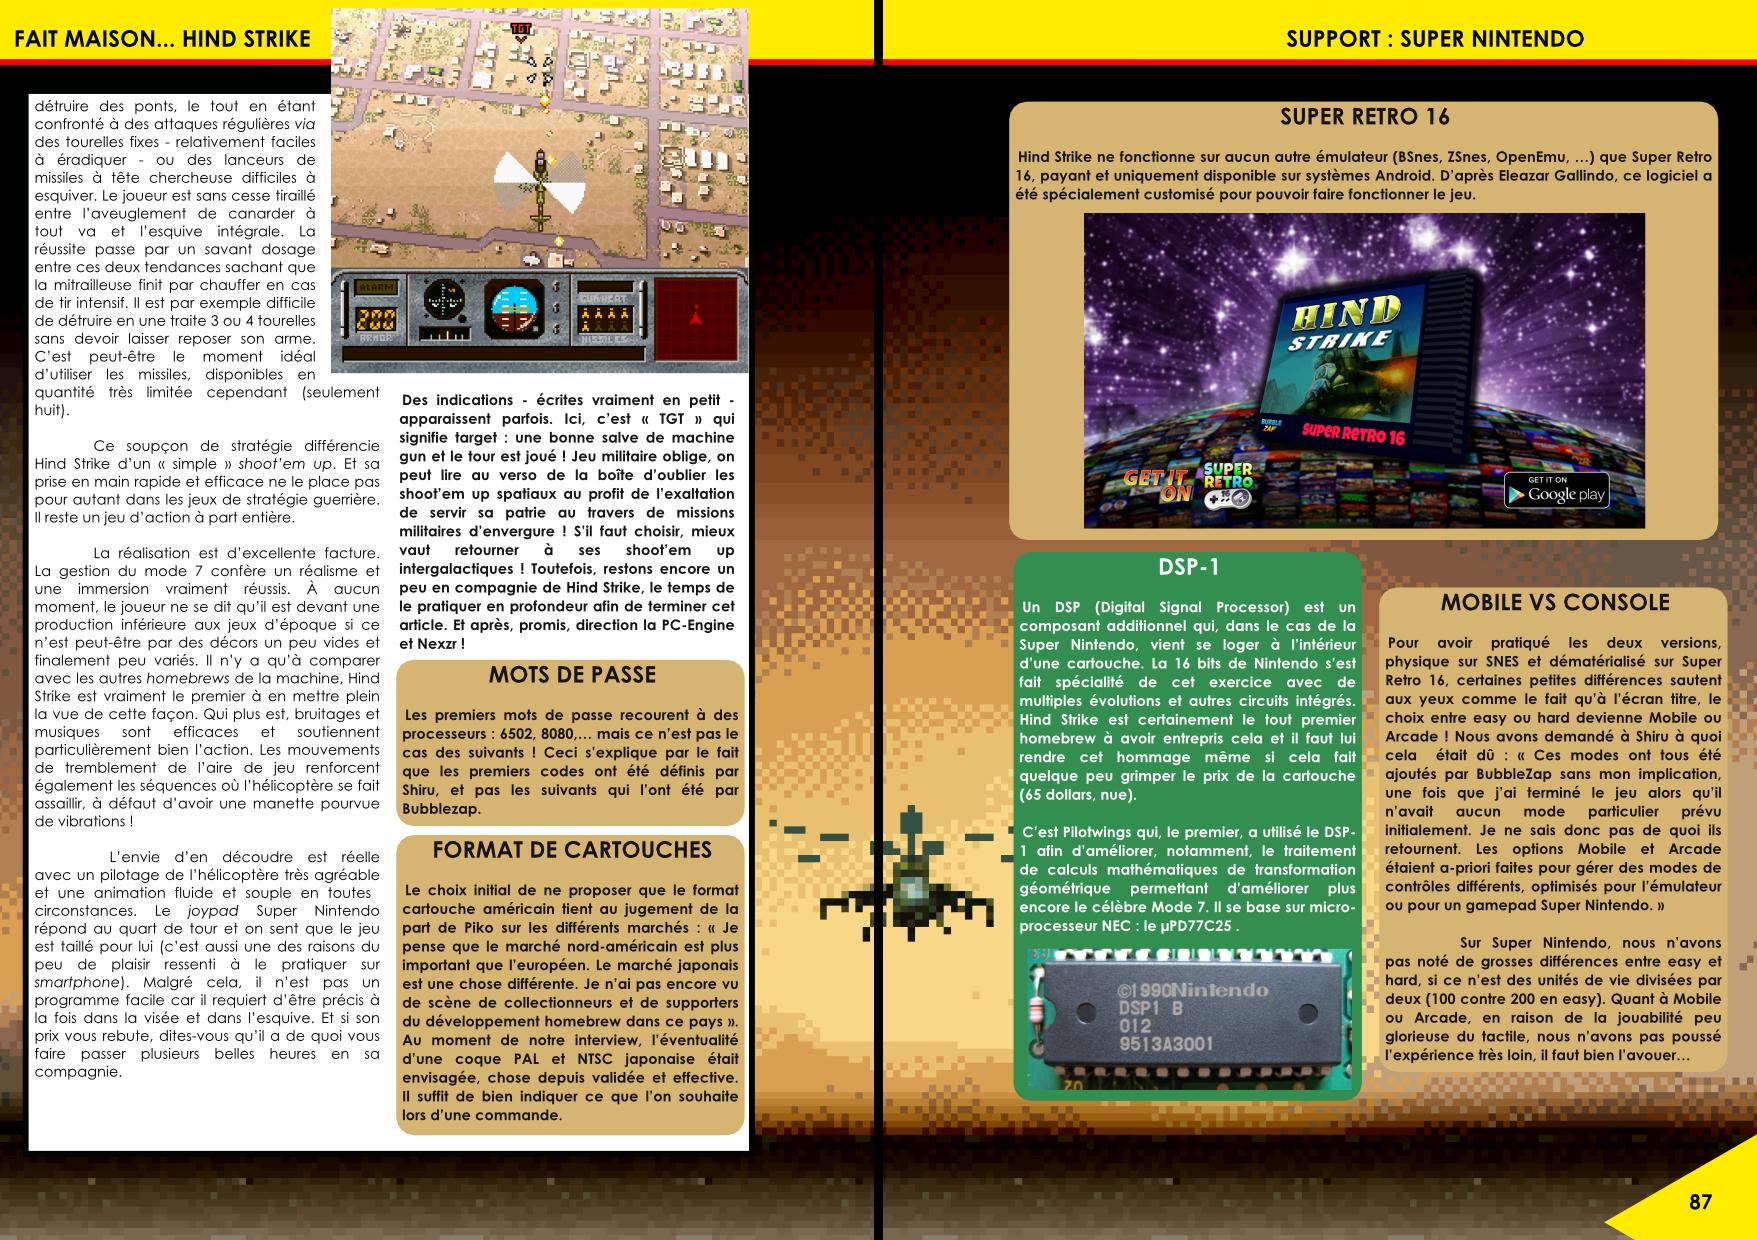 Hind Strike Super Nintendo de Piko Interactve article de Côté Gamers